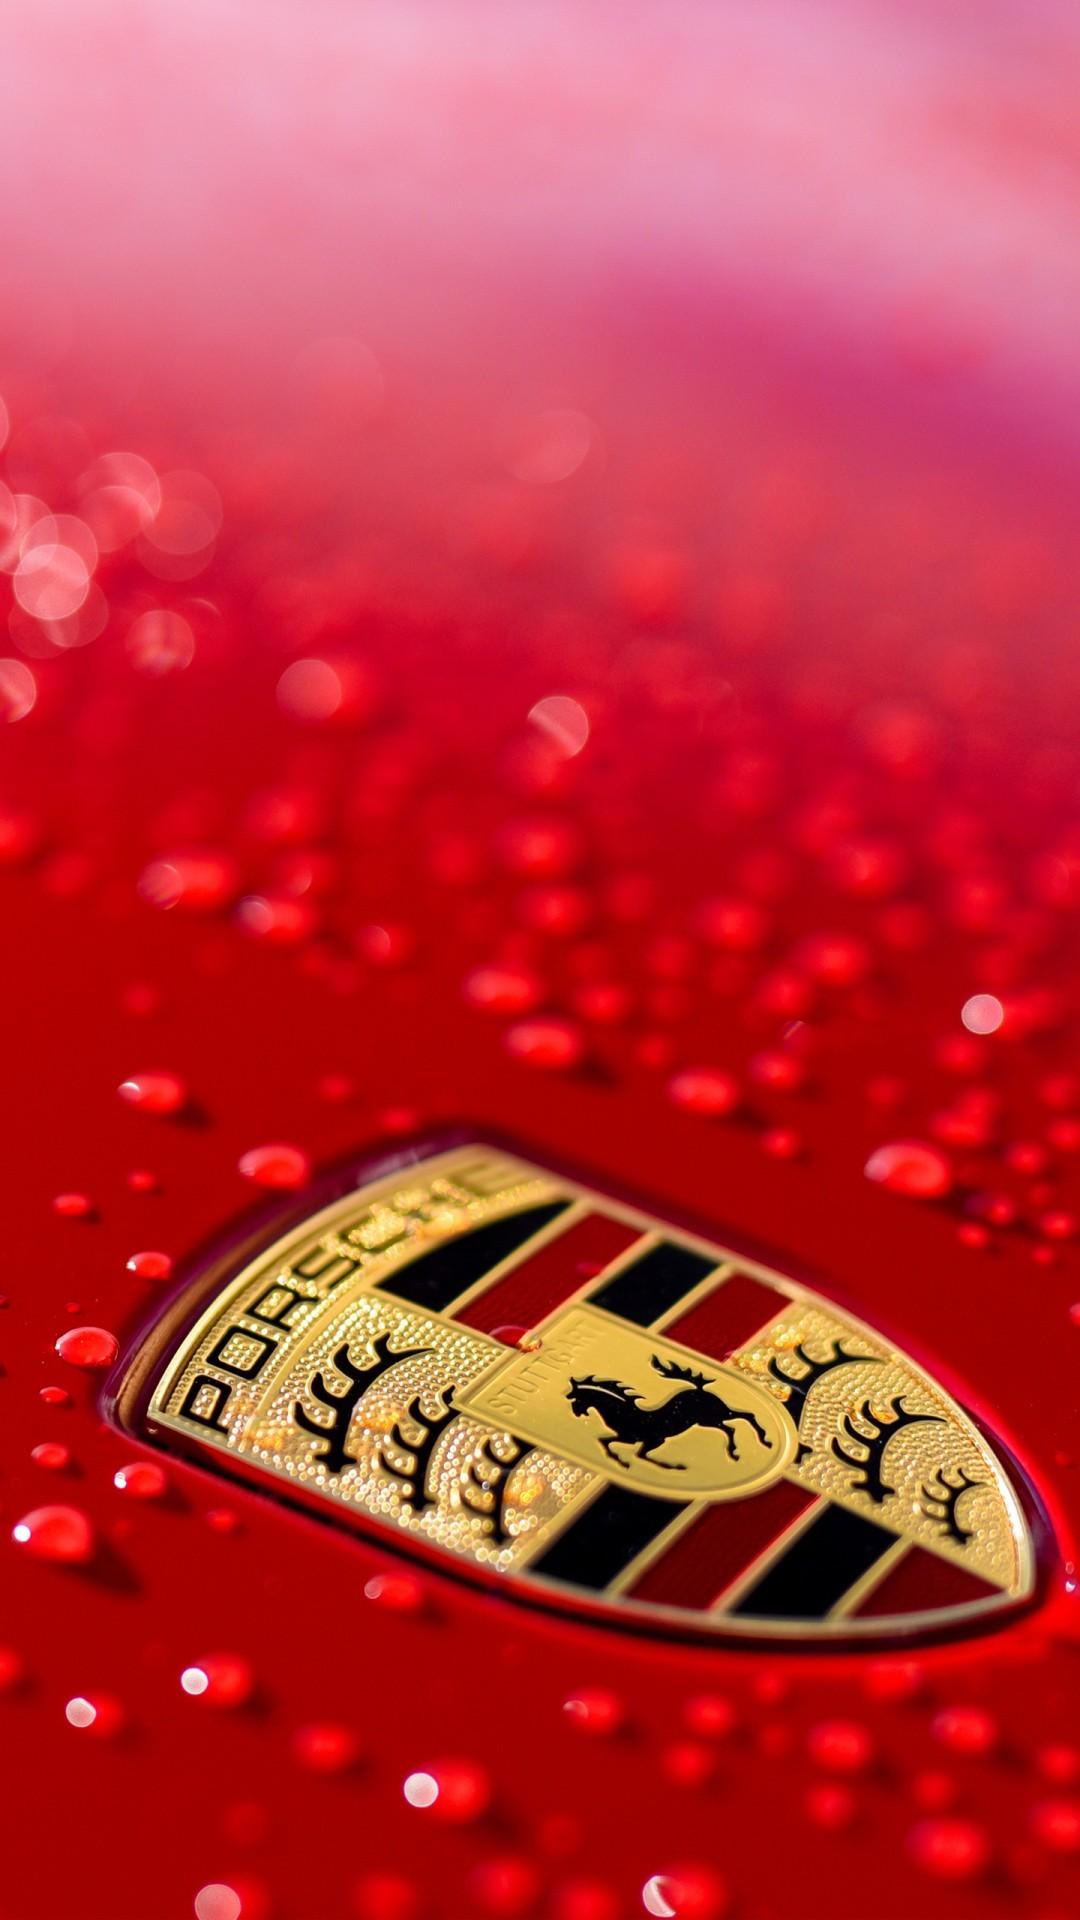 Free Porsche Logo phone wallpaper by melissa2069